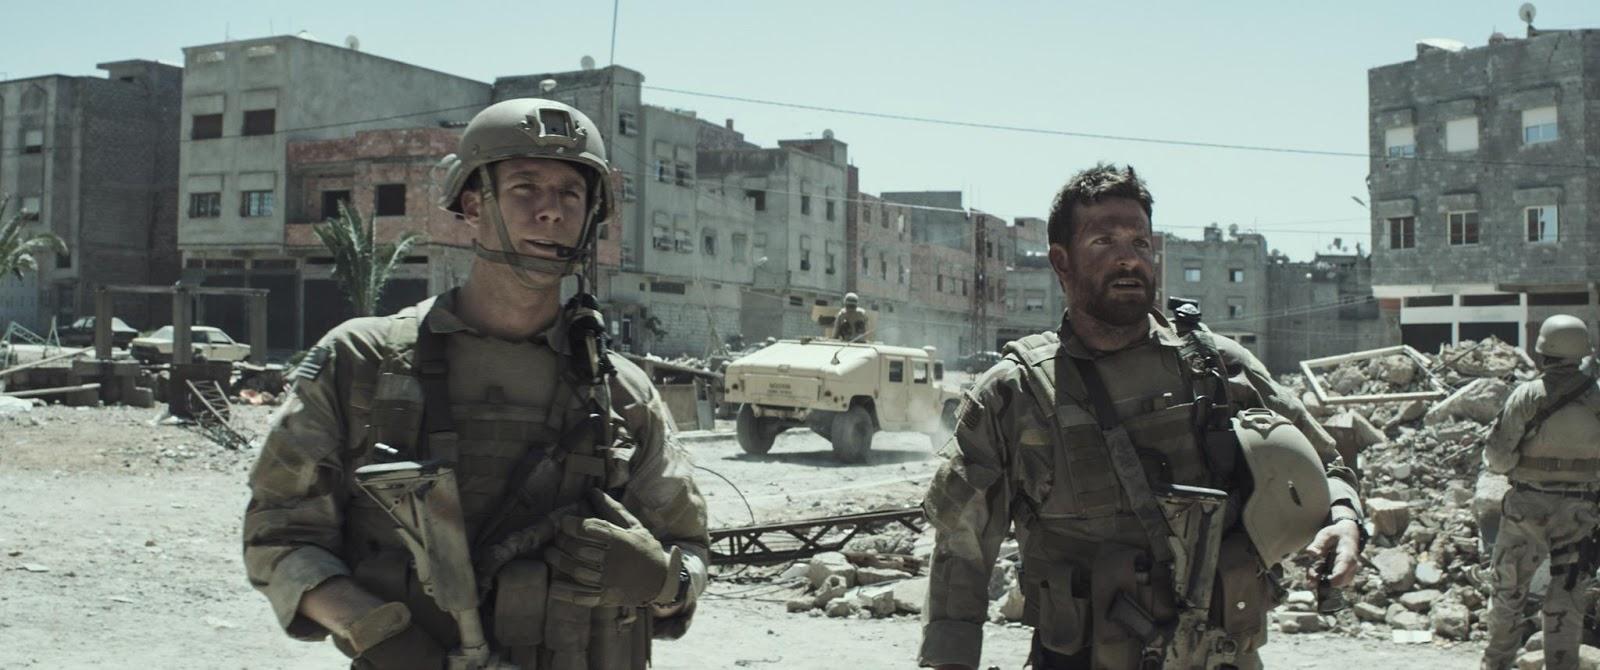 http://4.bp.blogspot.com/-YqGYA4k2lBc/VJ9yq1ZUNsI/AAAAAAADZeM/XuTWwW-DWXI/s1600/American_Sniper-Bradley_Cooper-Jake_McDorman-007.jpg